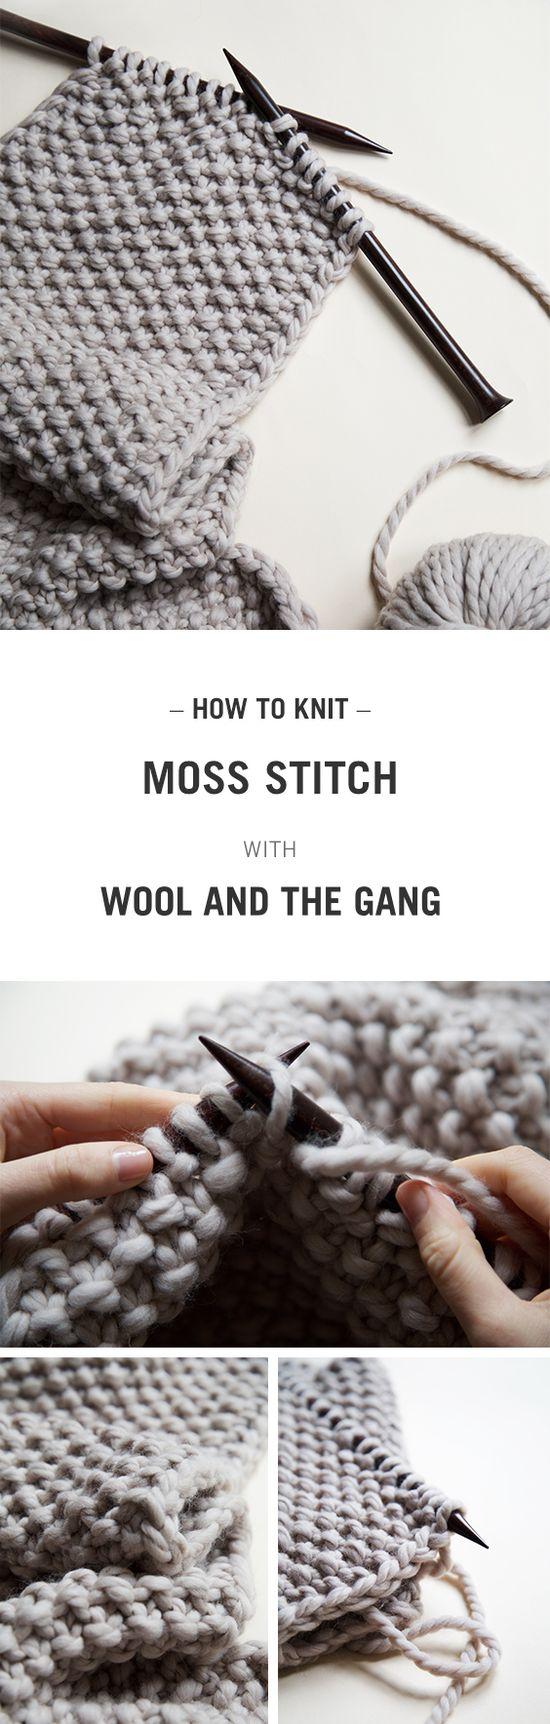 Knit and chrochet  Board